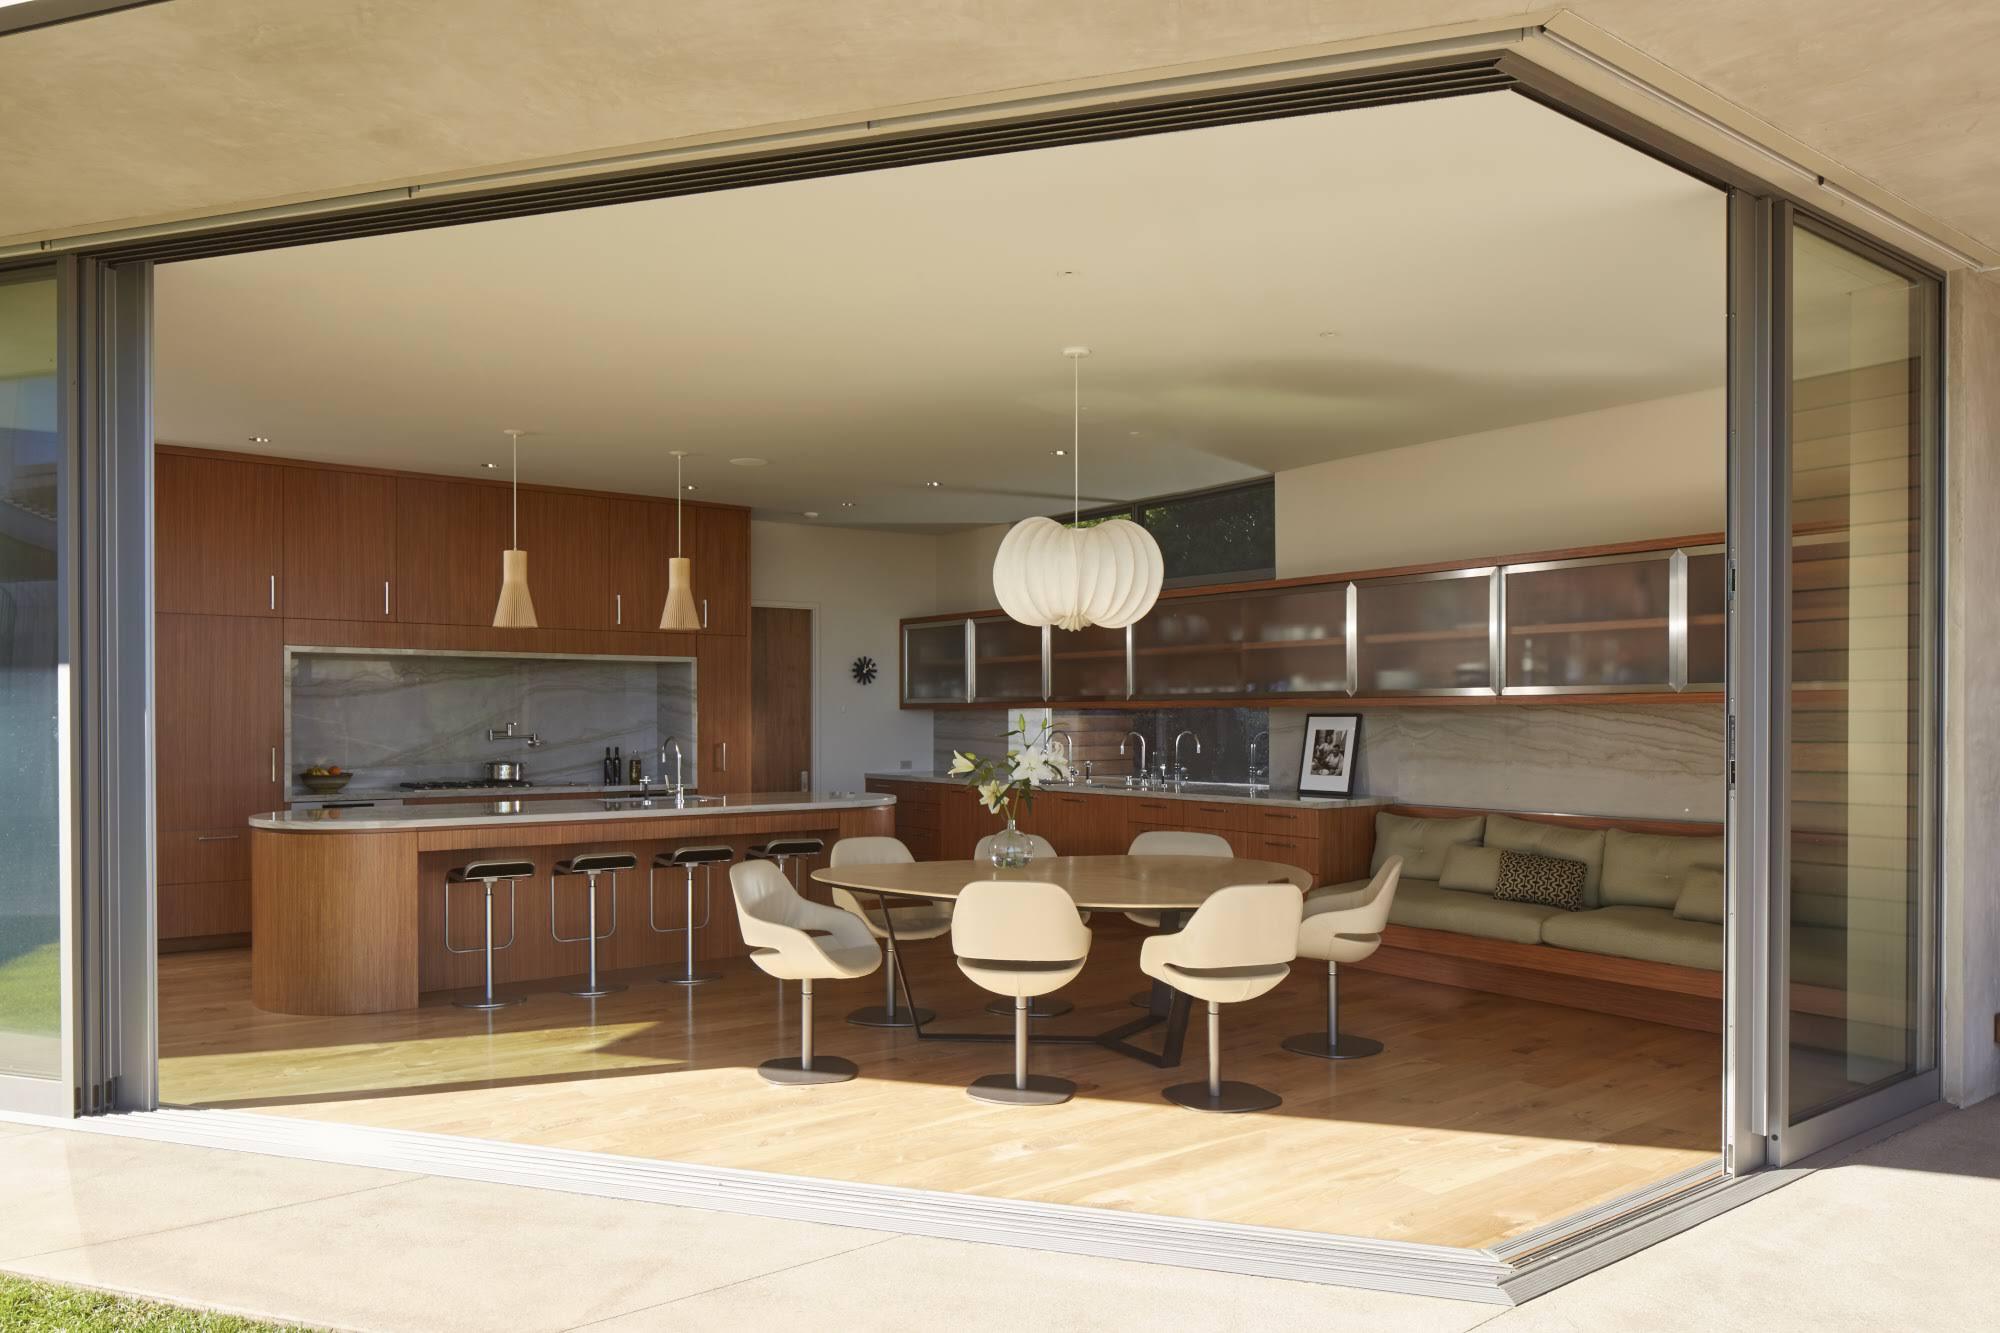 studio-william-hefner-chautauqua_Mandabach__Ext__Back__034A__Patio;__Kitchen_view_F__(RD)